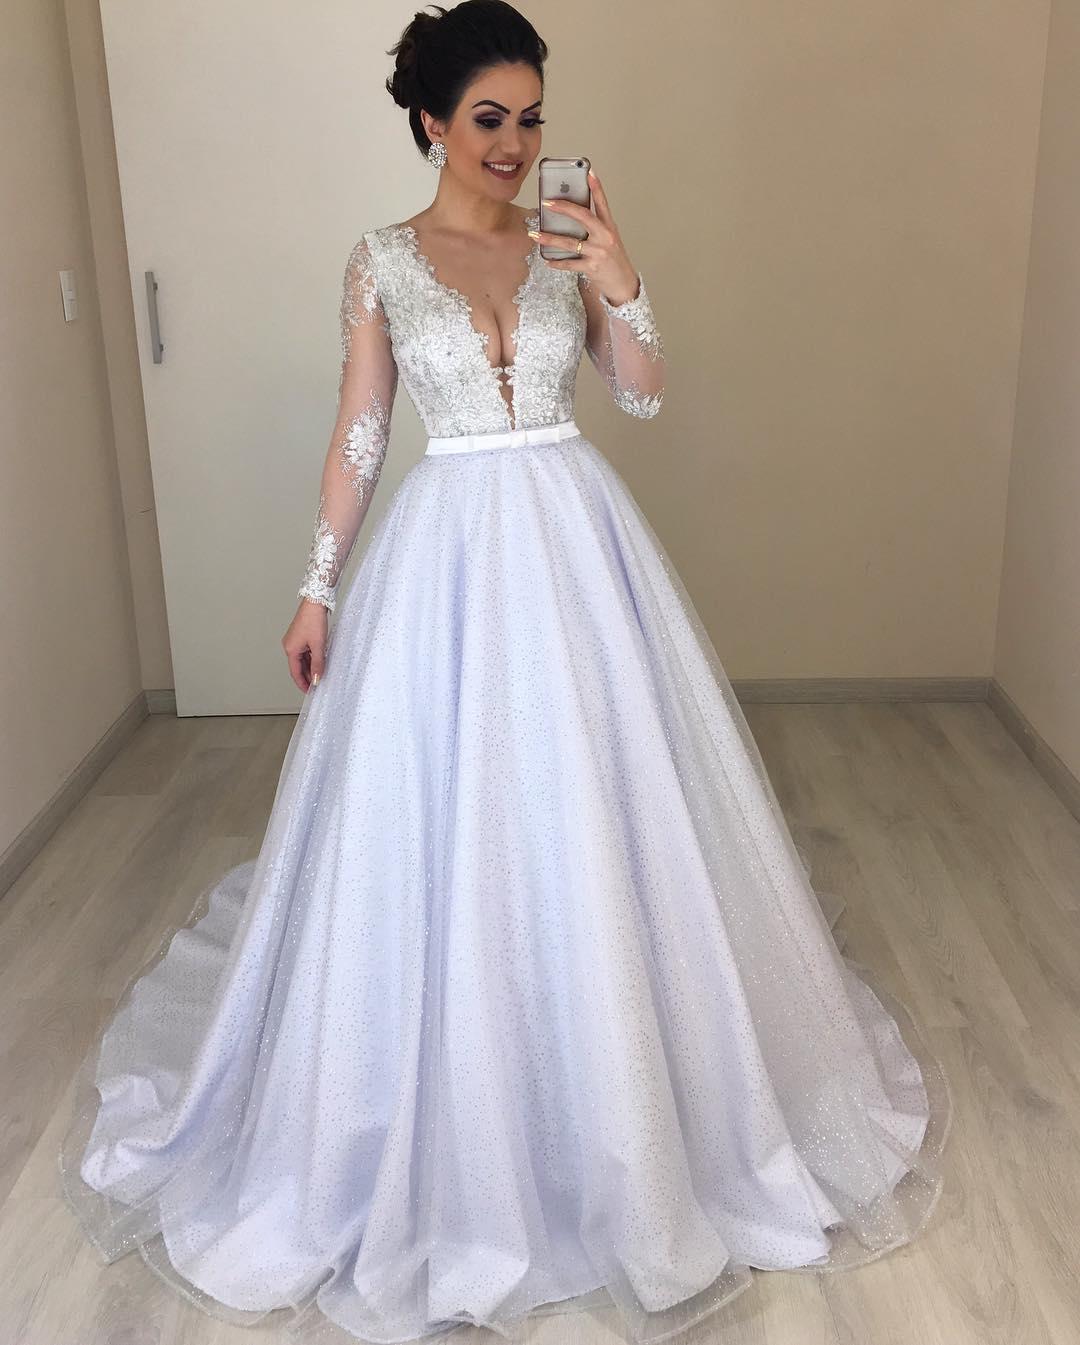 2019 Long Sleeve Lace V Neck Vintage Wedding Dress Bridal Gown Custom Size 2-26W